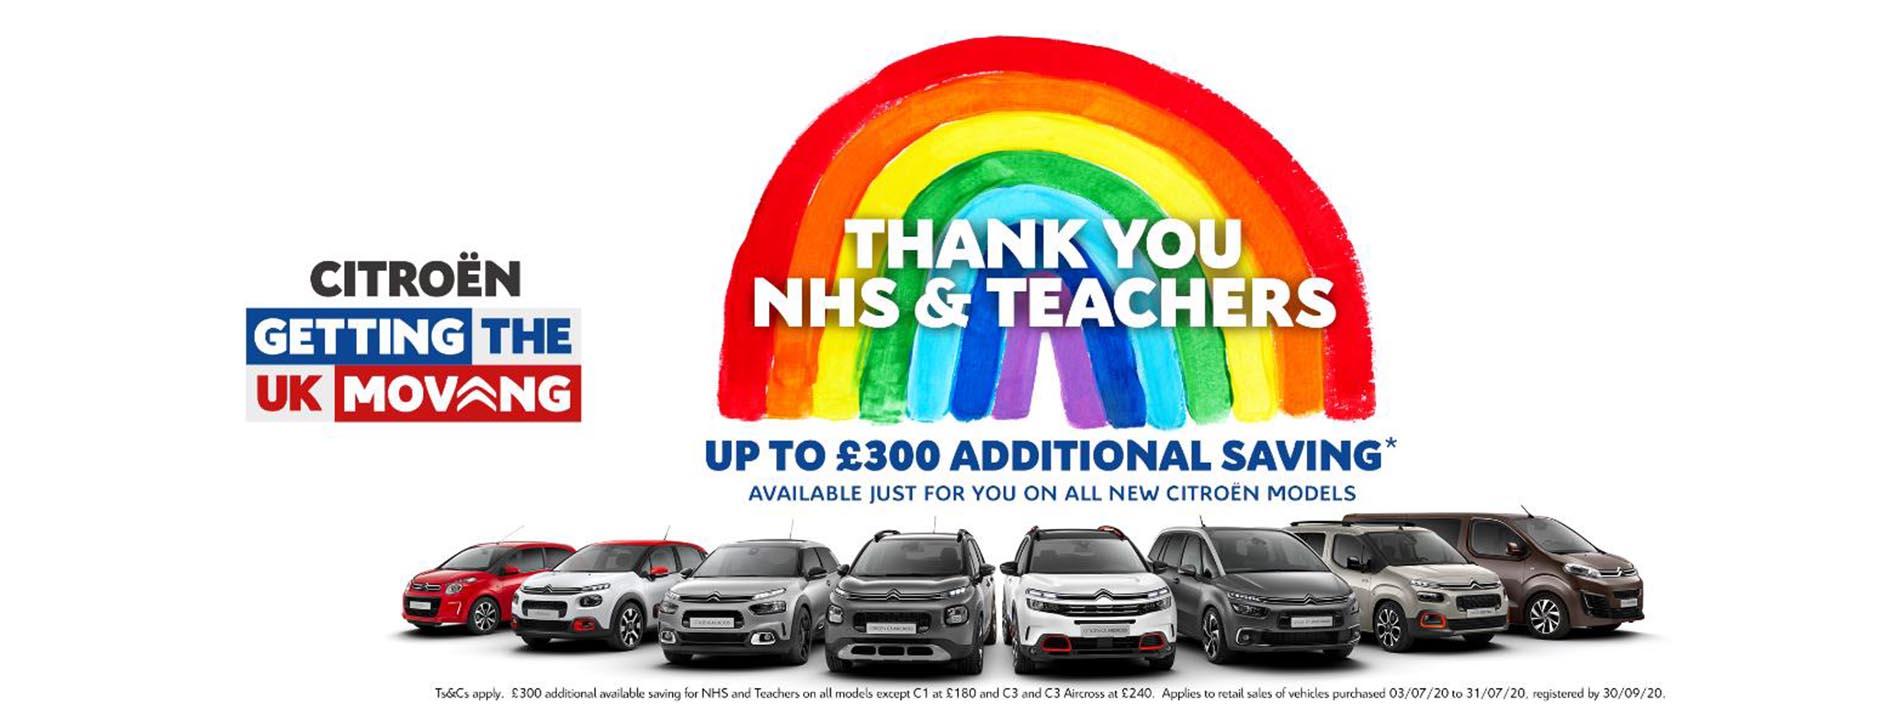 citroen-nhs-teachers-car-discount-m-sli